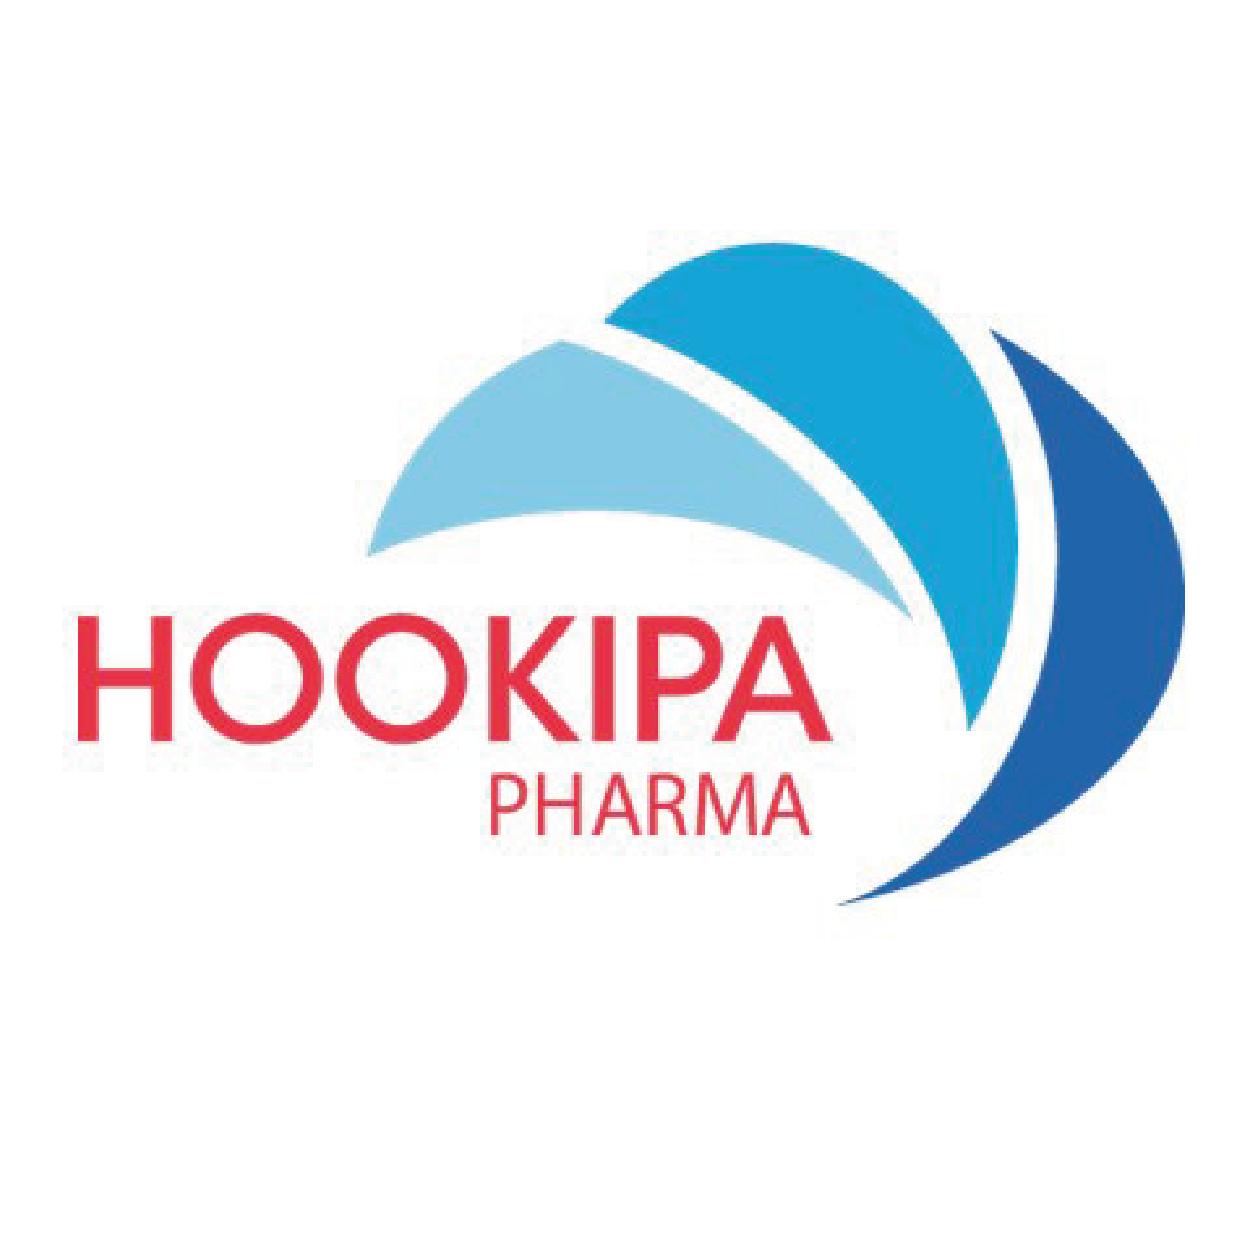 Hookipa Pharma